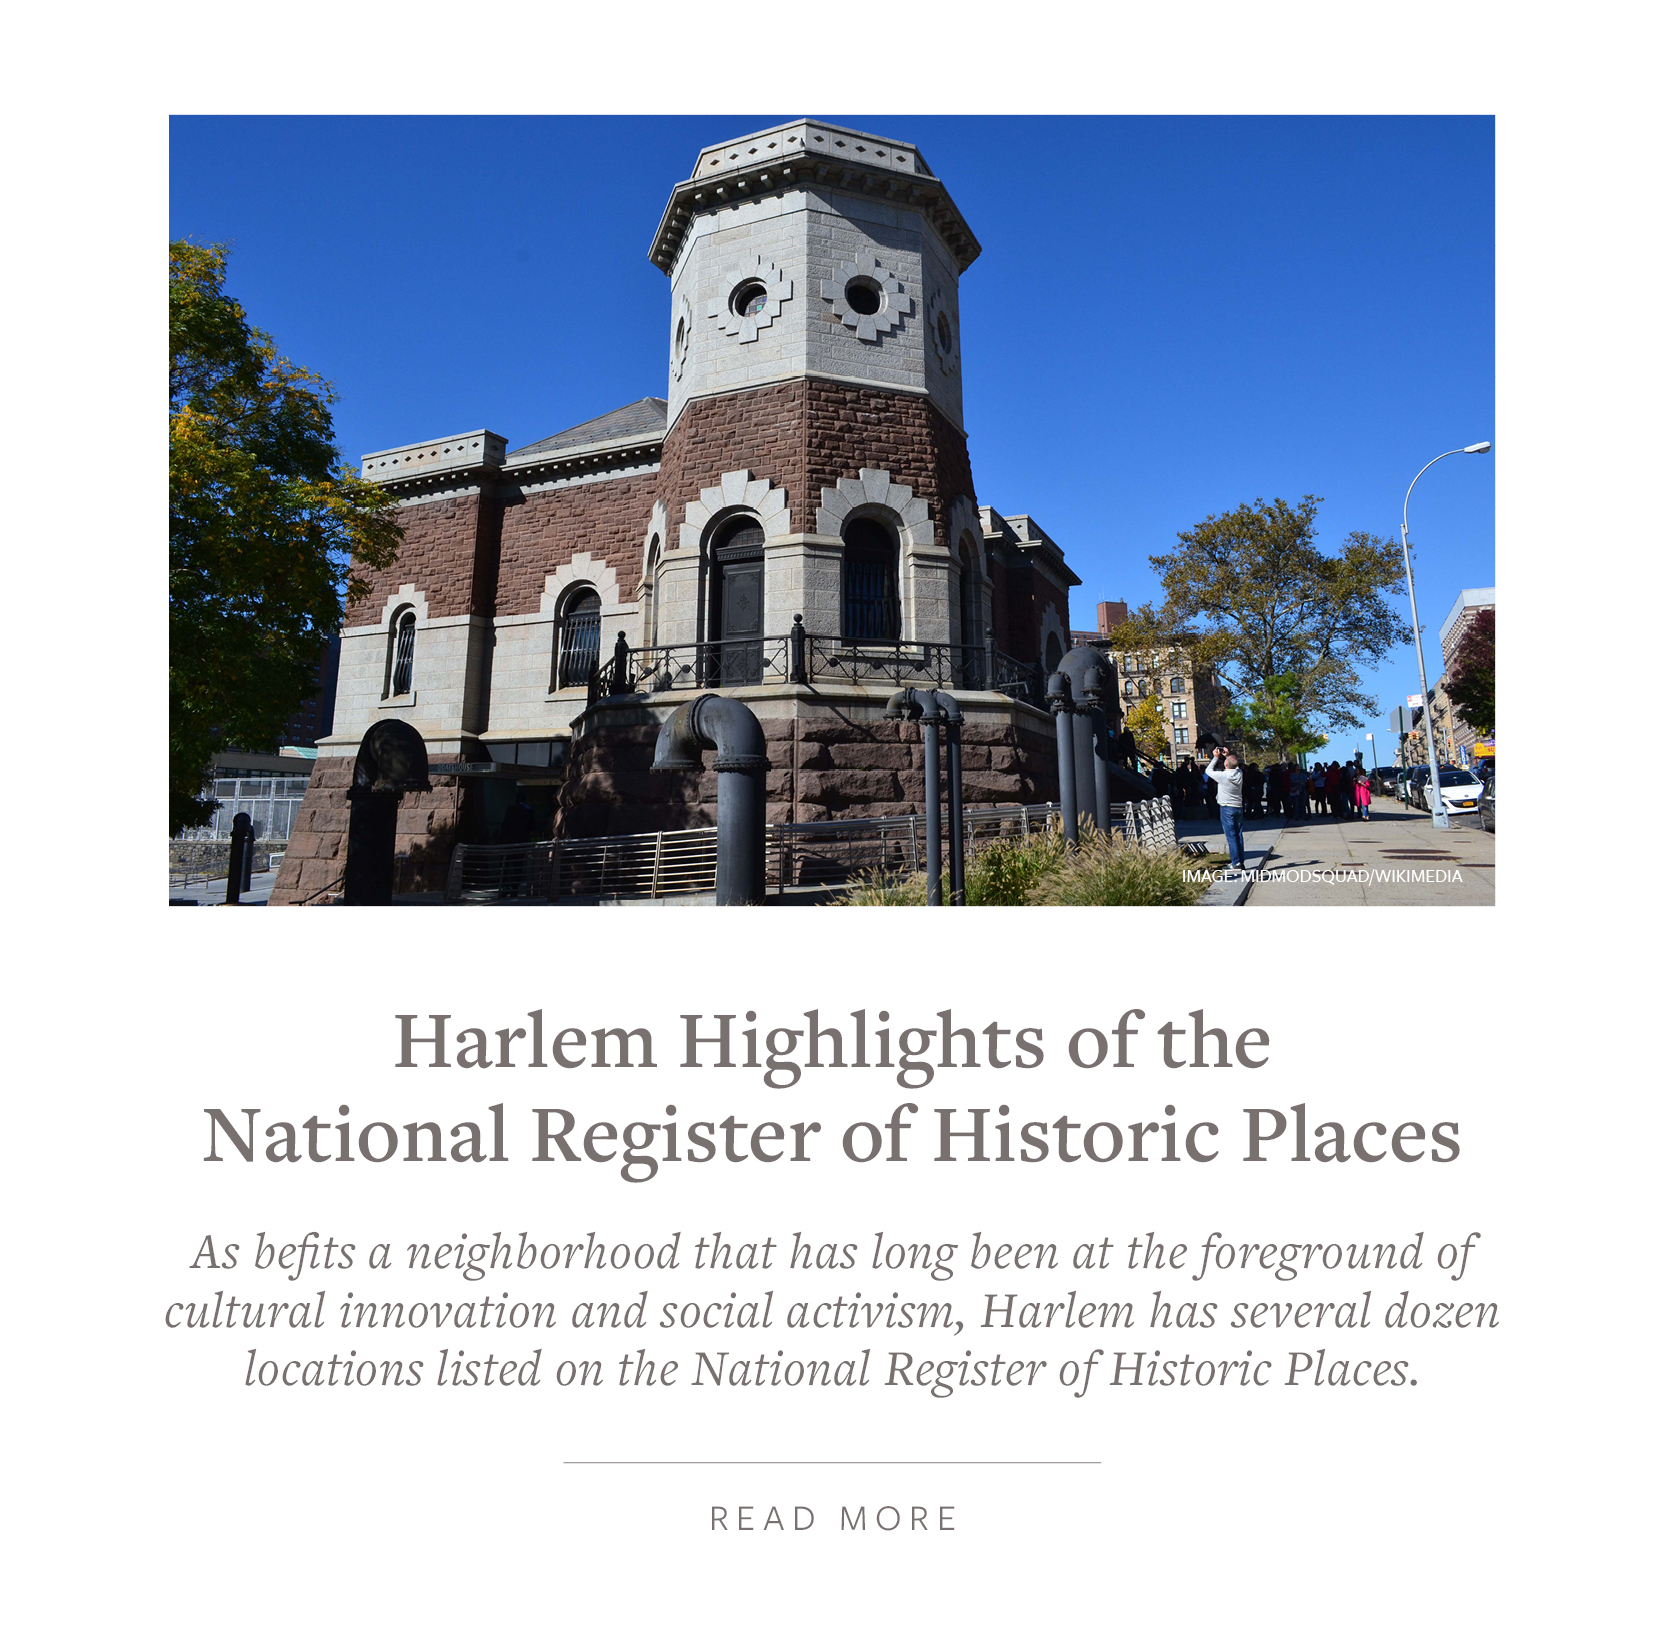 Harlems Cultural Innovation and Social Activism